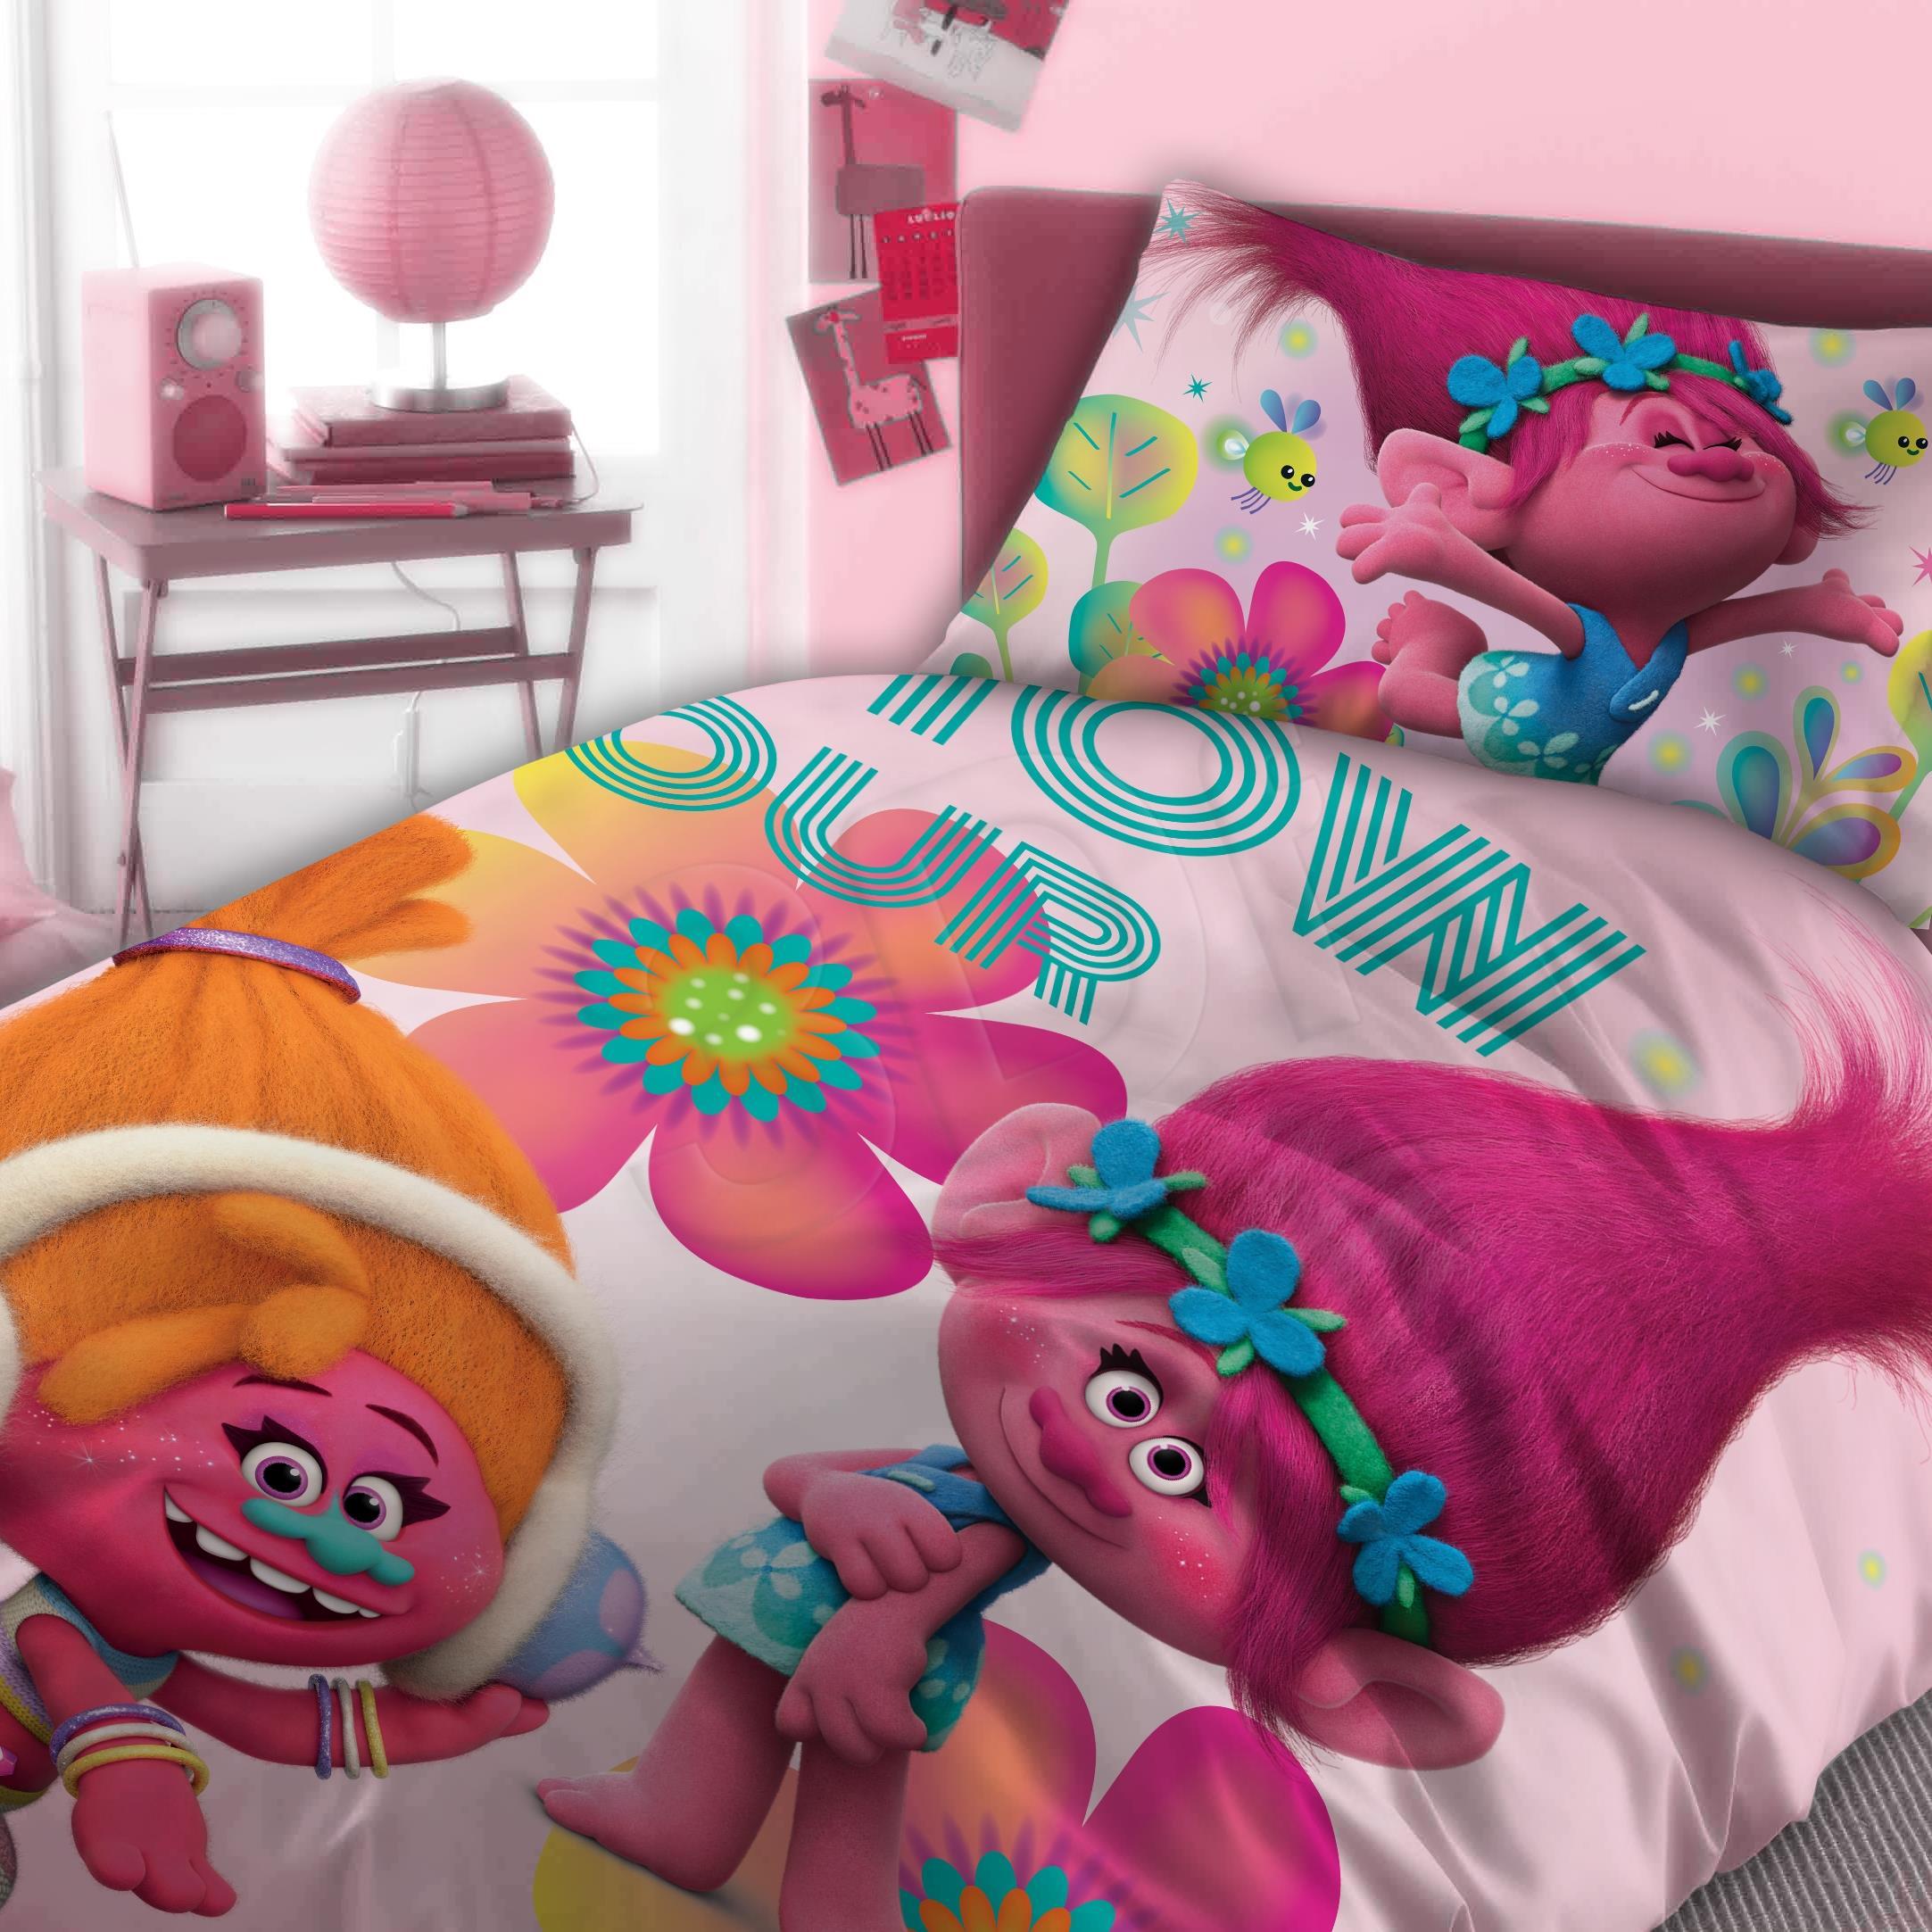 Bed linen Faro  FAO080 (140x200 cm, 70x90 cm; orange color, pink color) FAO080 Gultas veļa